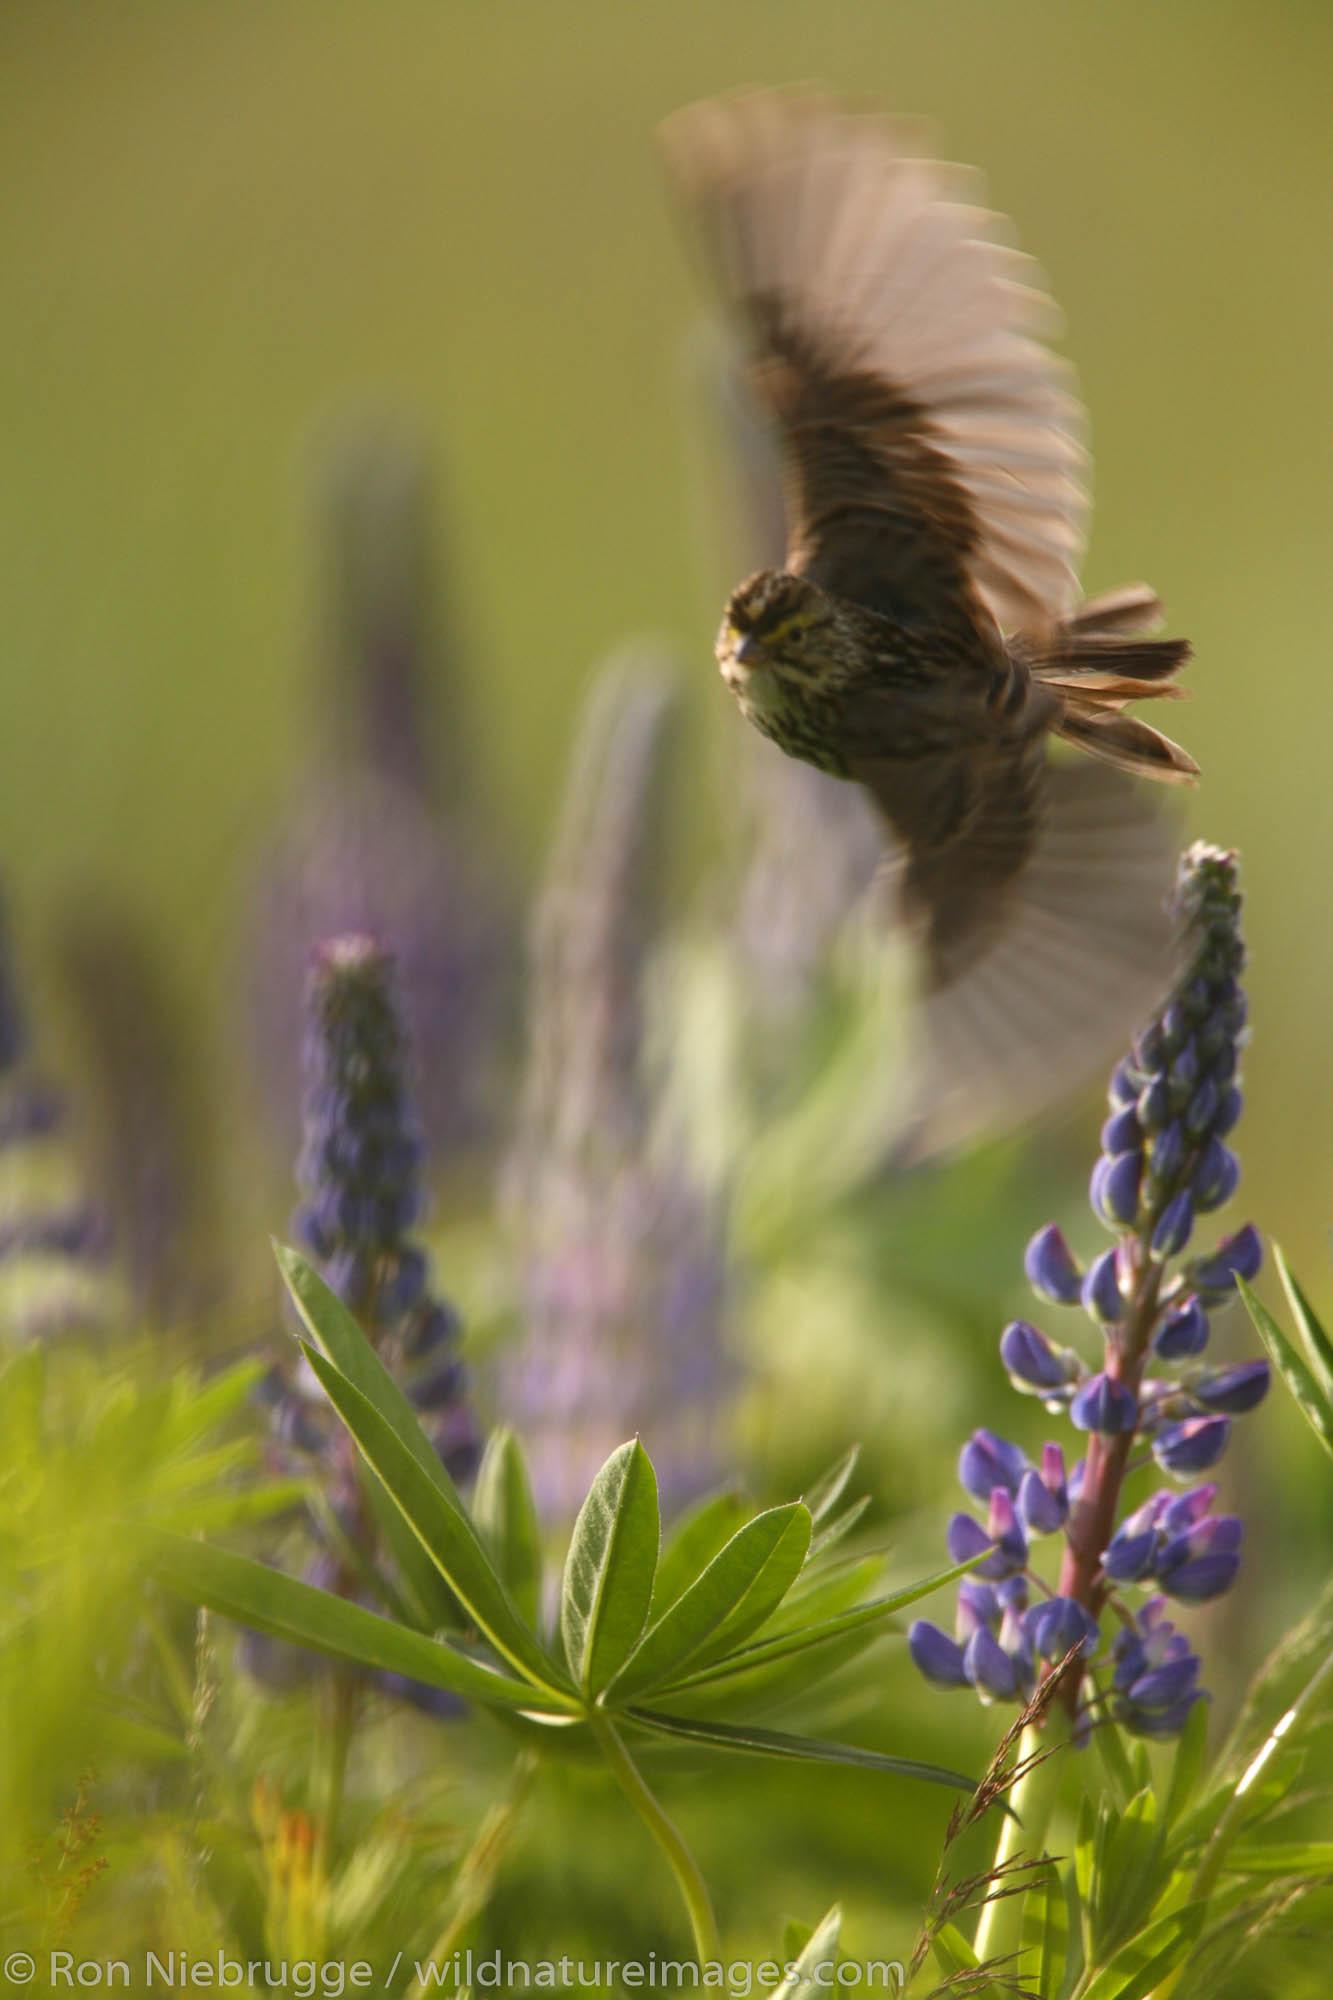 Savannah Sparrow perched on Lupine, Kenai Peninsula, Chugach National Forest, Alaska.